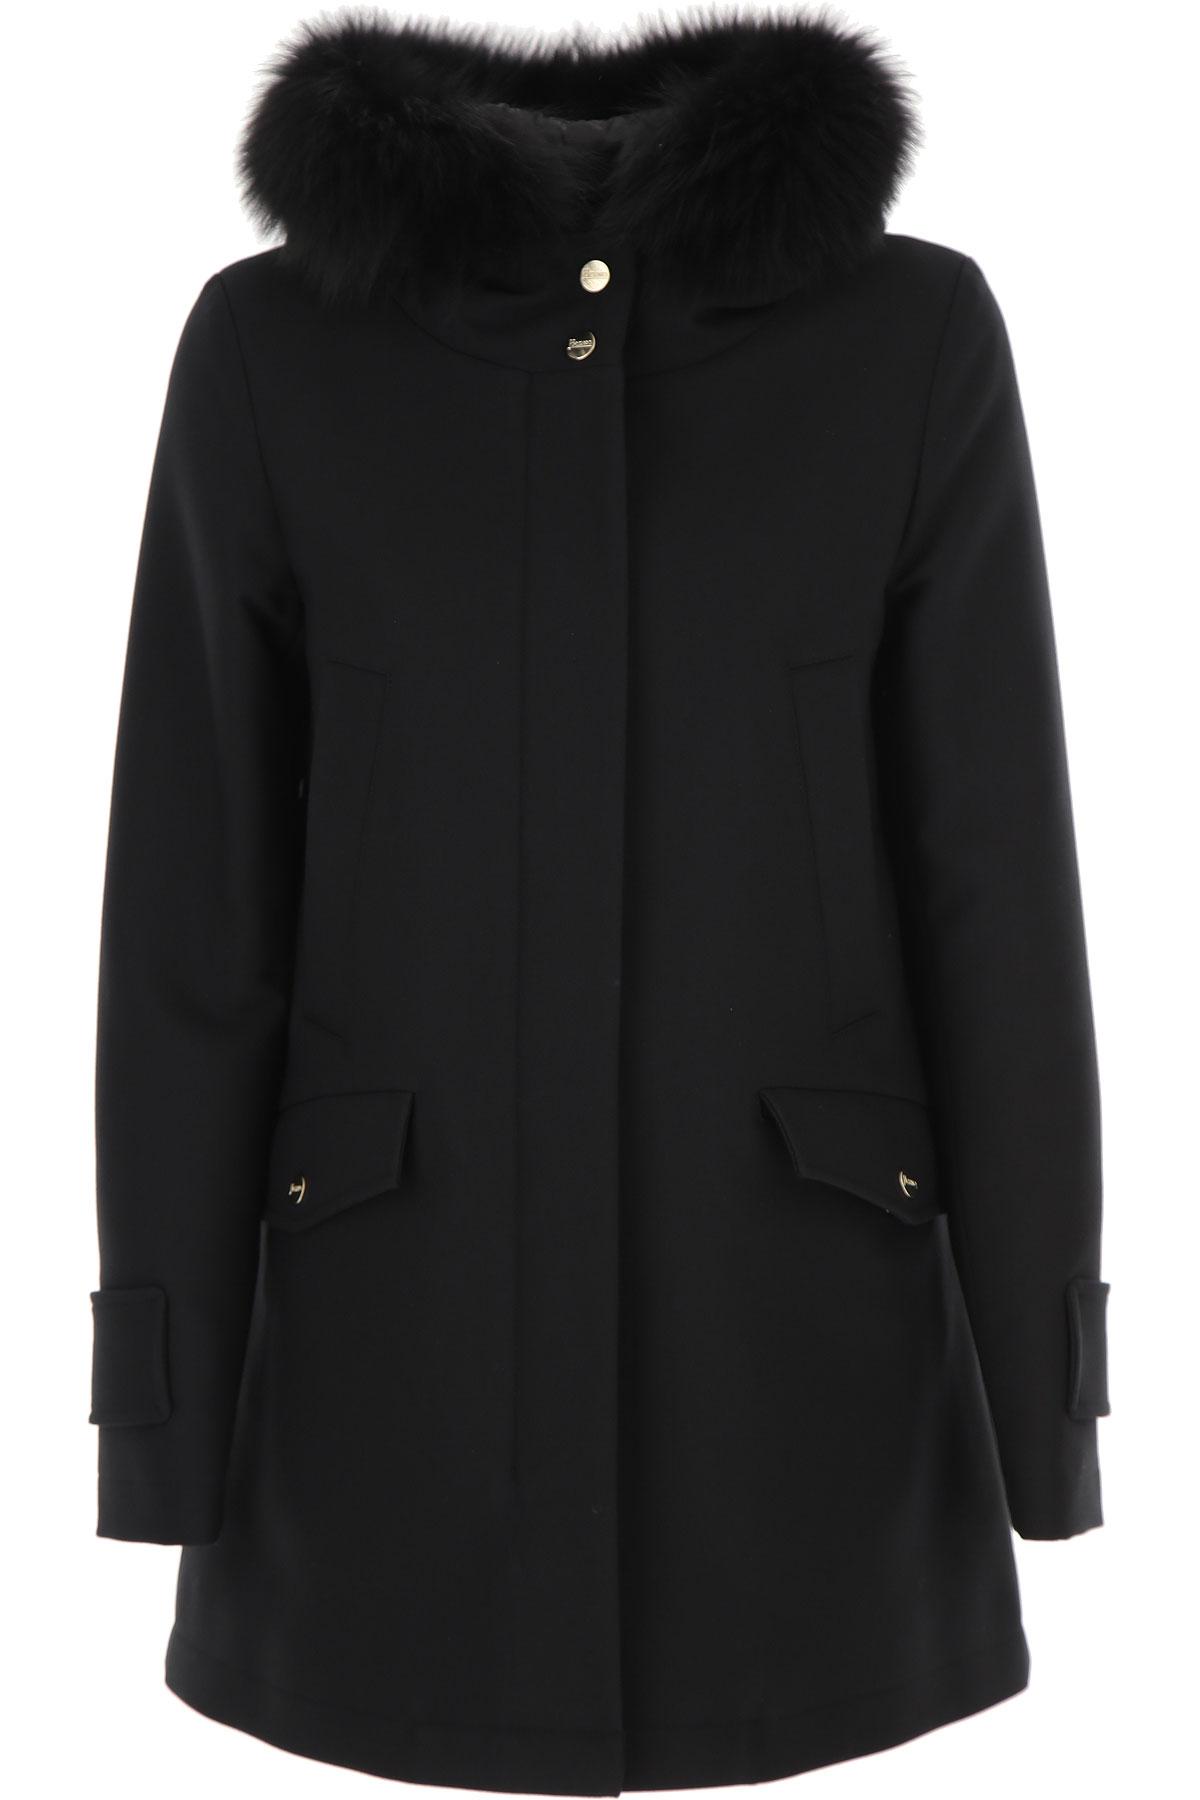 Herno Down Jacket for Women, Puffer Ski Jacket On Sale, Black, Cotton, 2019, 10 4 6 8